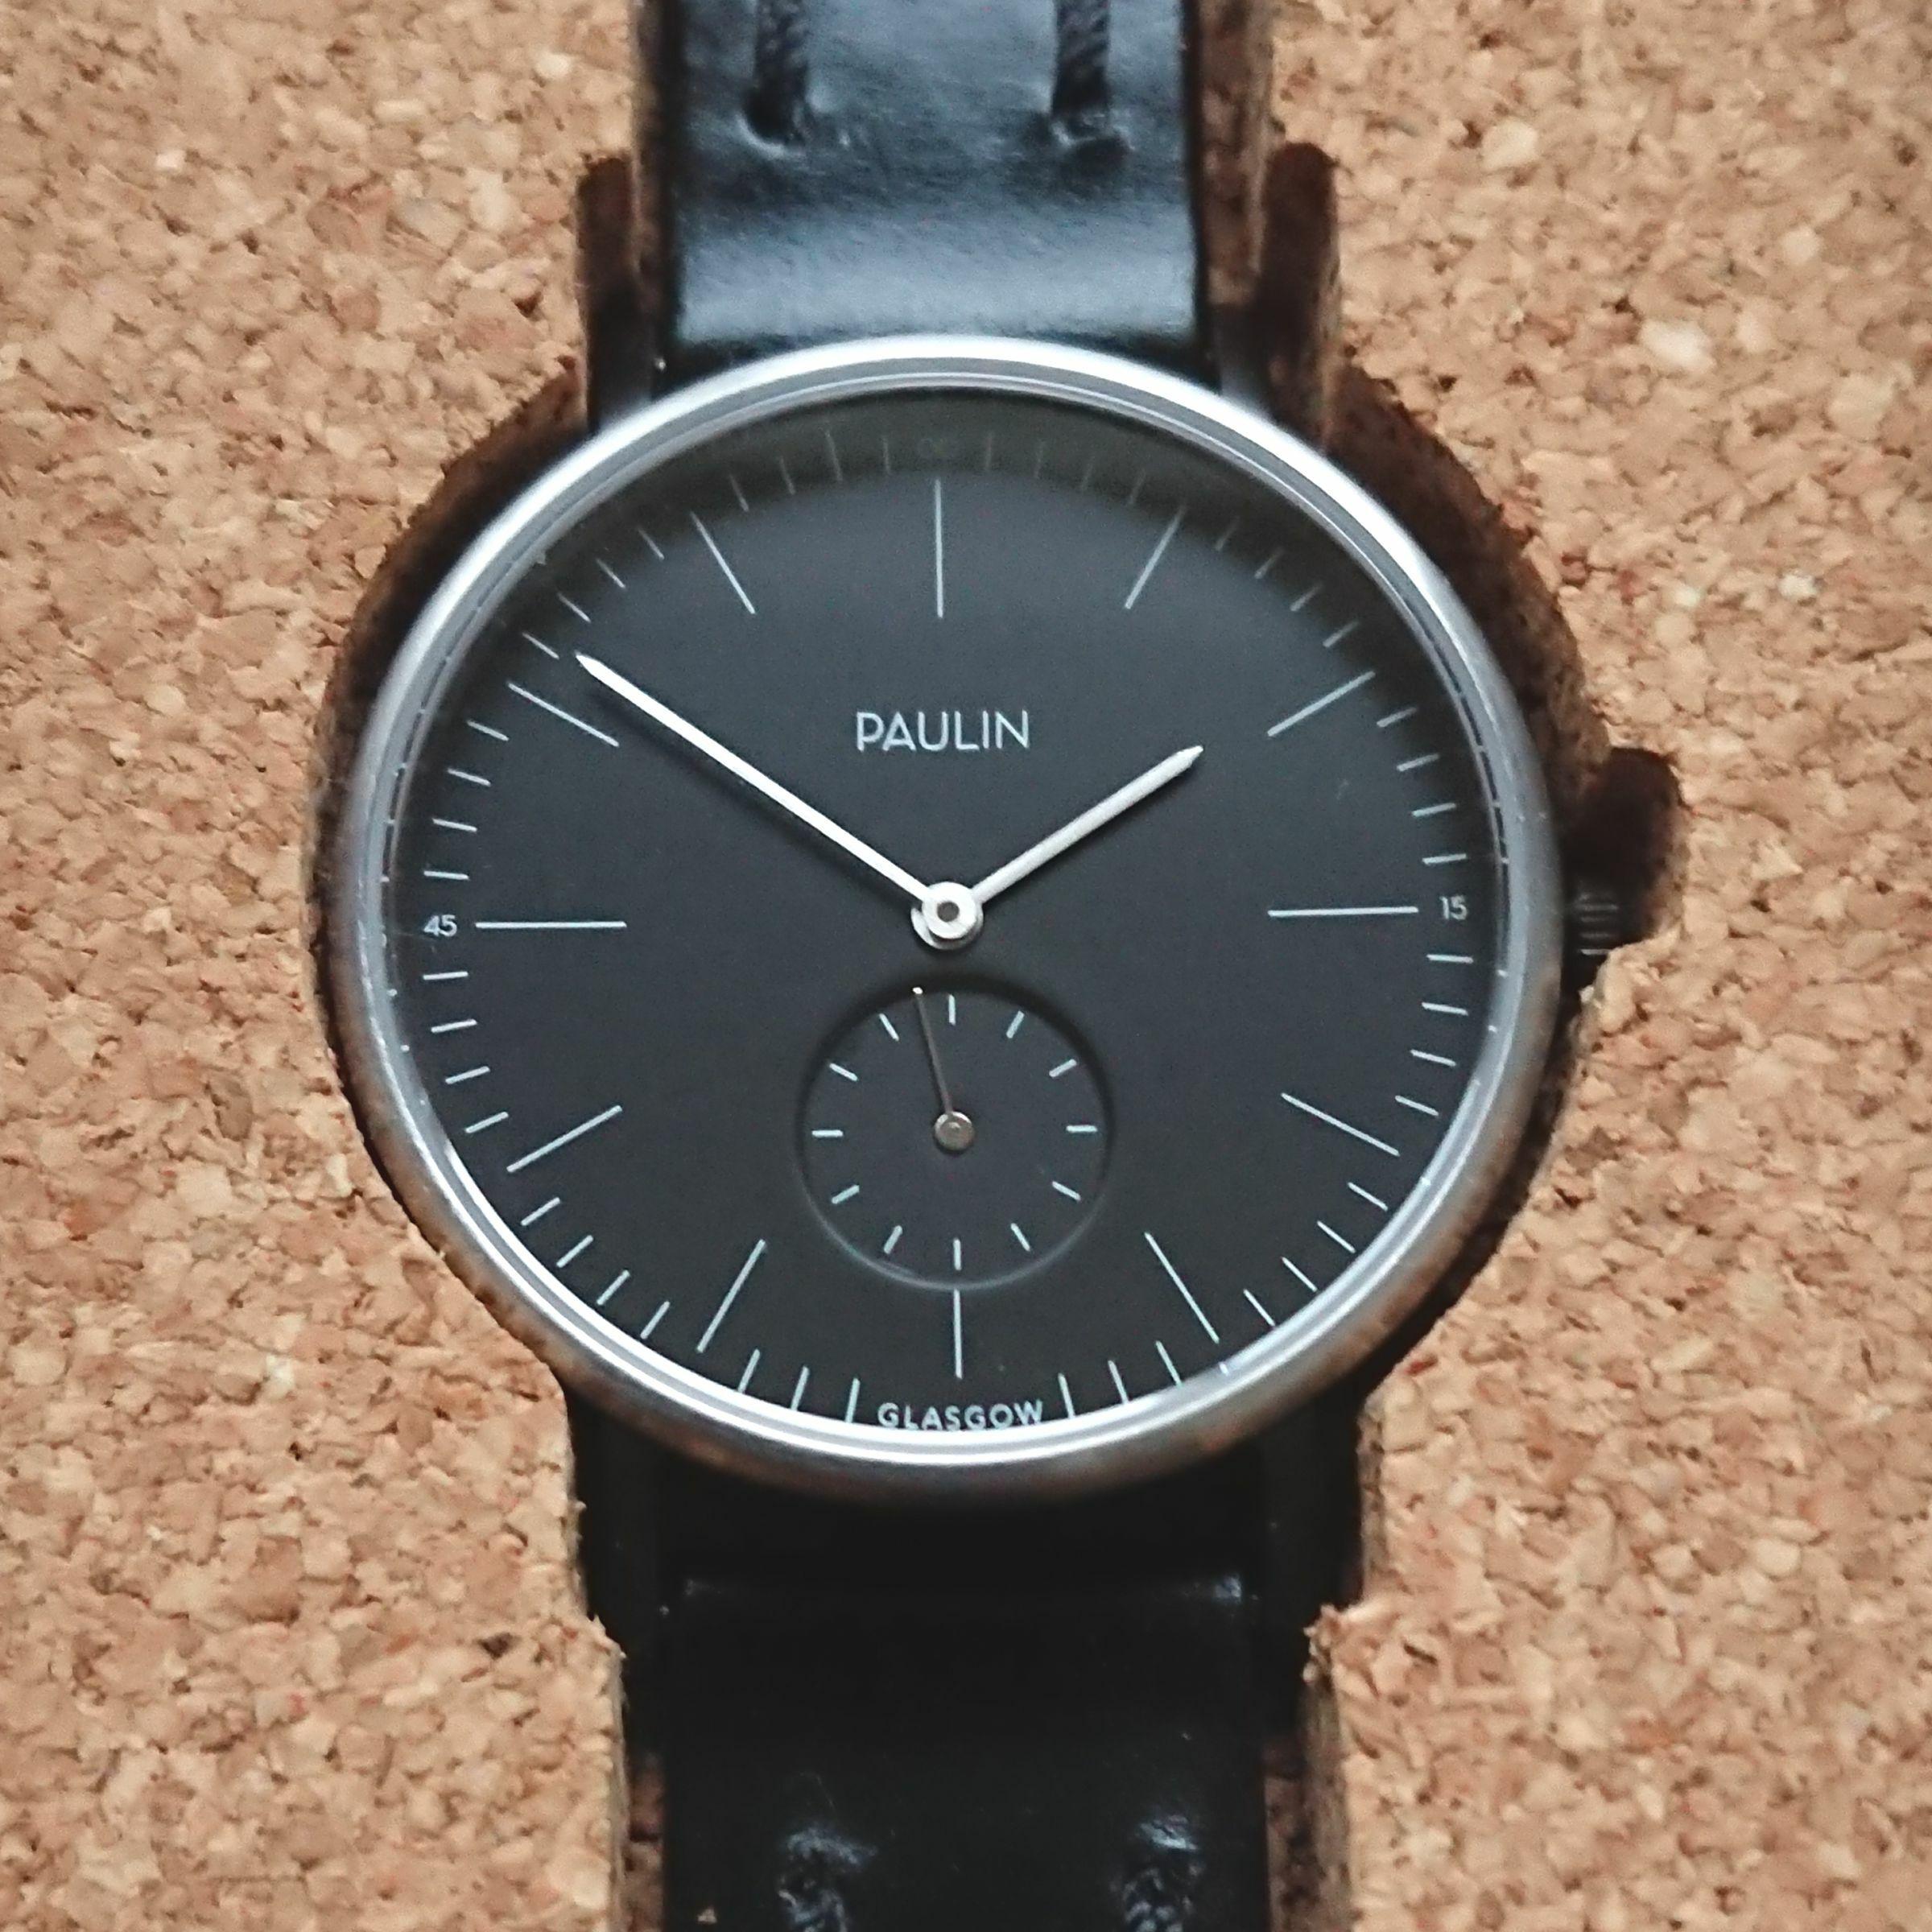 PAULIN ポーリン コミューター ブラック/シルバー TO100B-BL-B